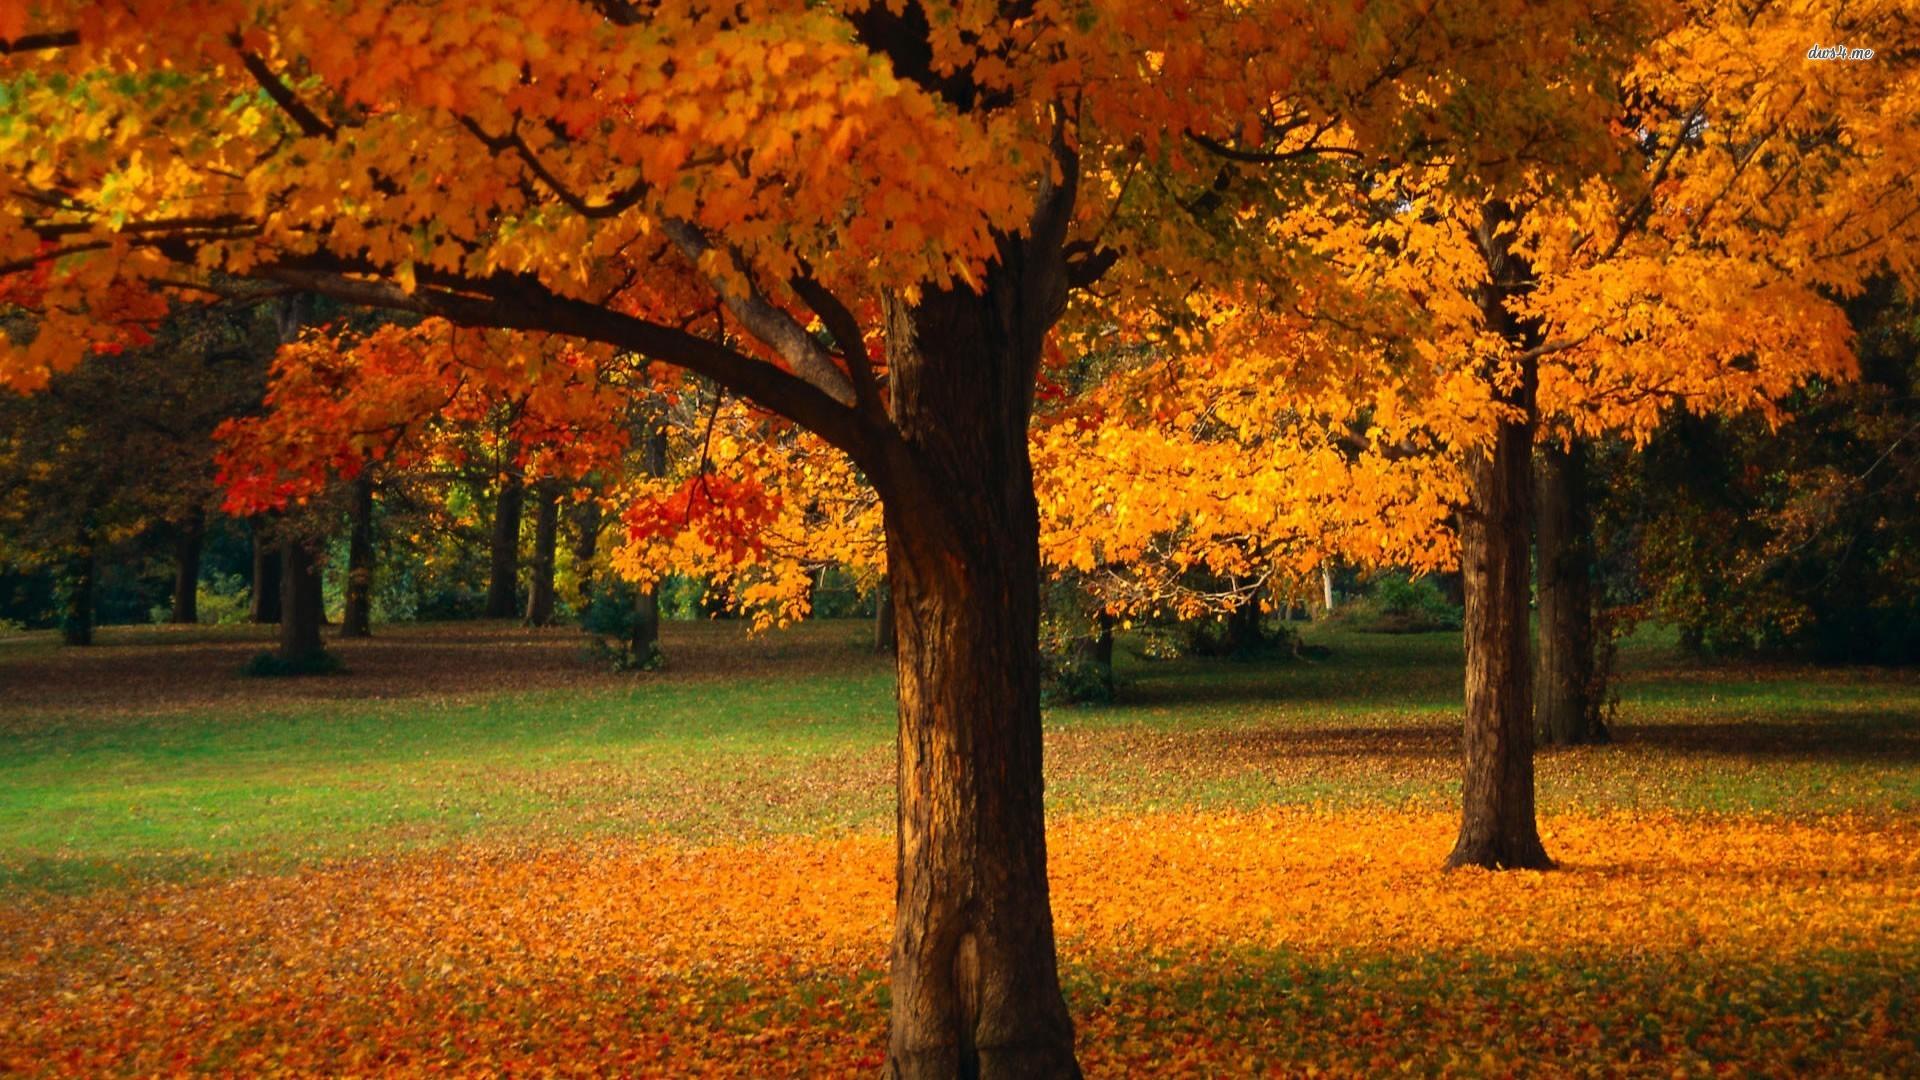 Fall Scenery Wallpapers Free Fondos Oto 241 O Wallpapers Autumn Fondos De Pantalla De Oto 241 O